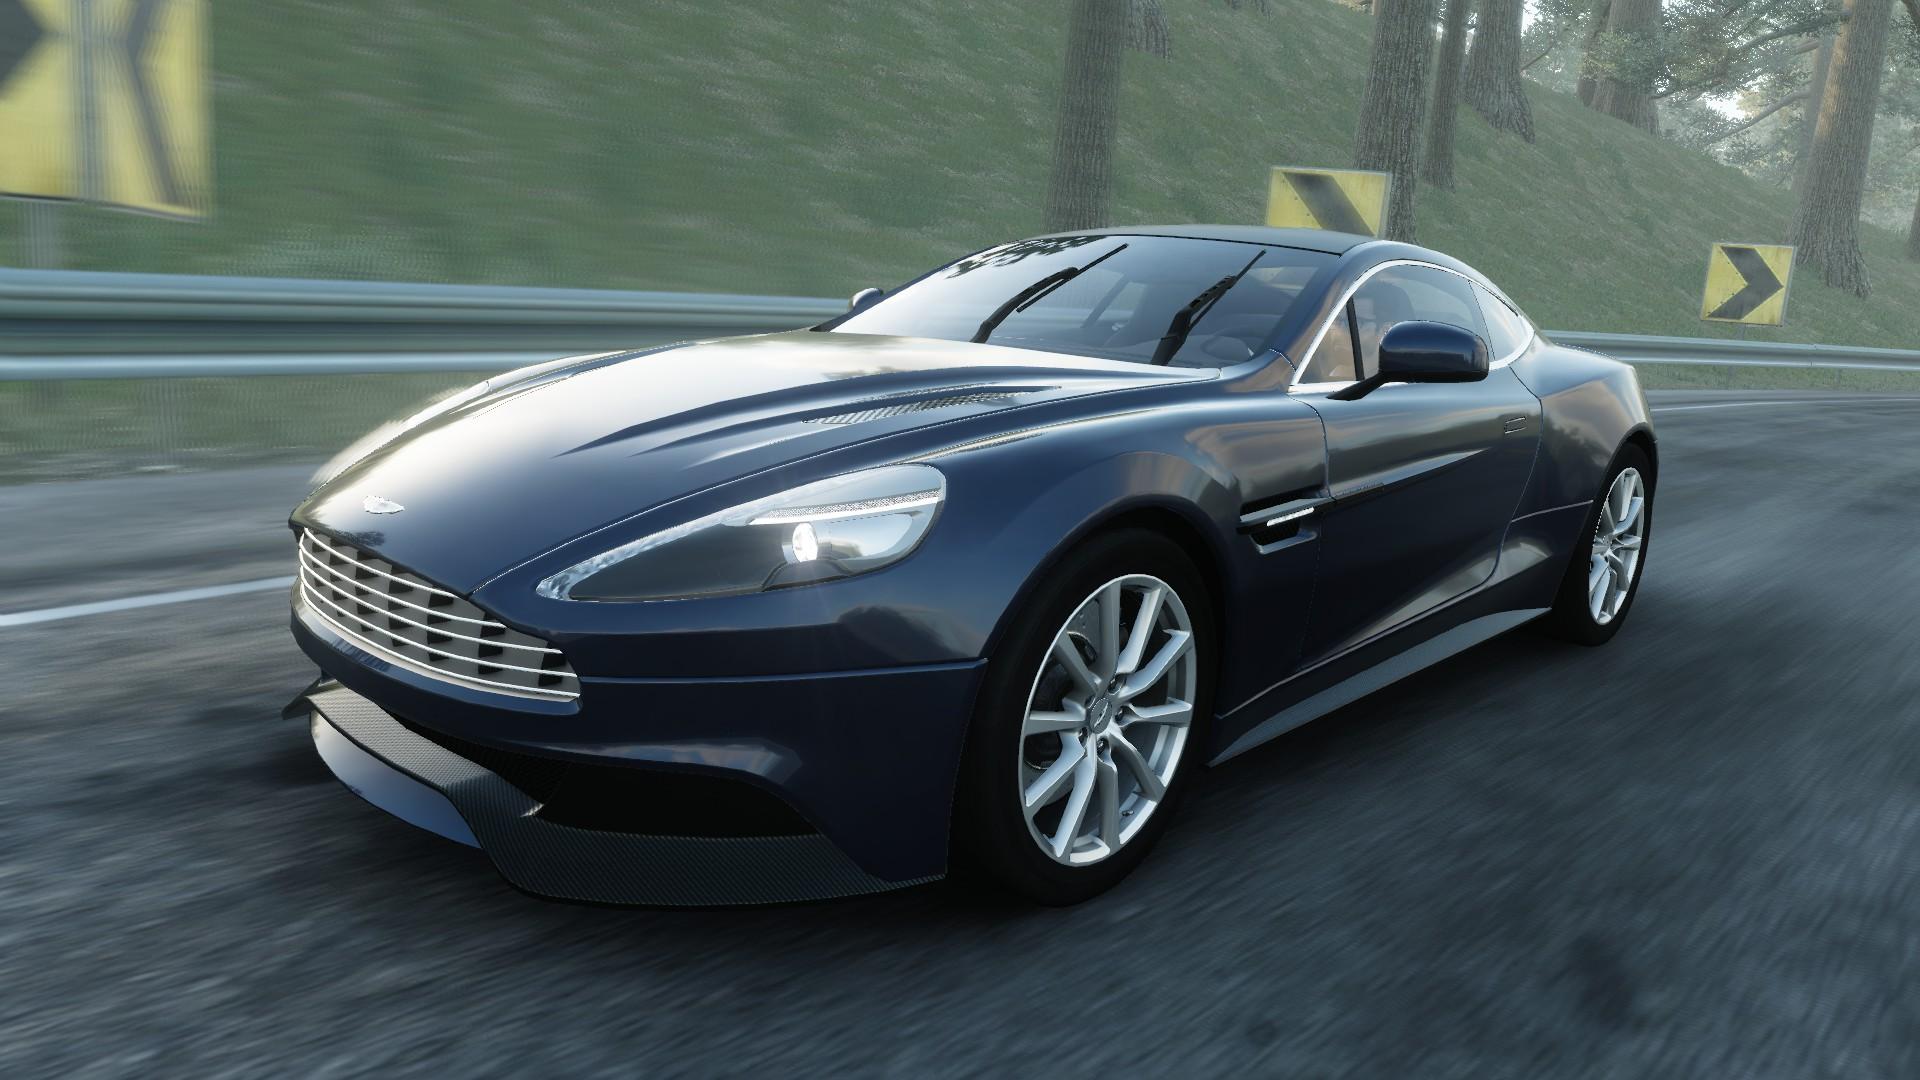 Aston Martin Vanquish The Crew Wiki Fandom Powered By